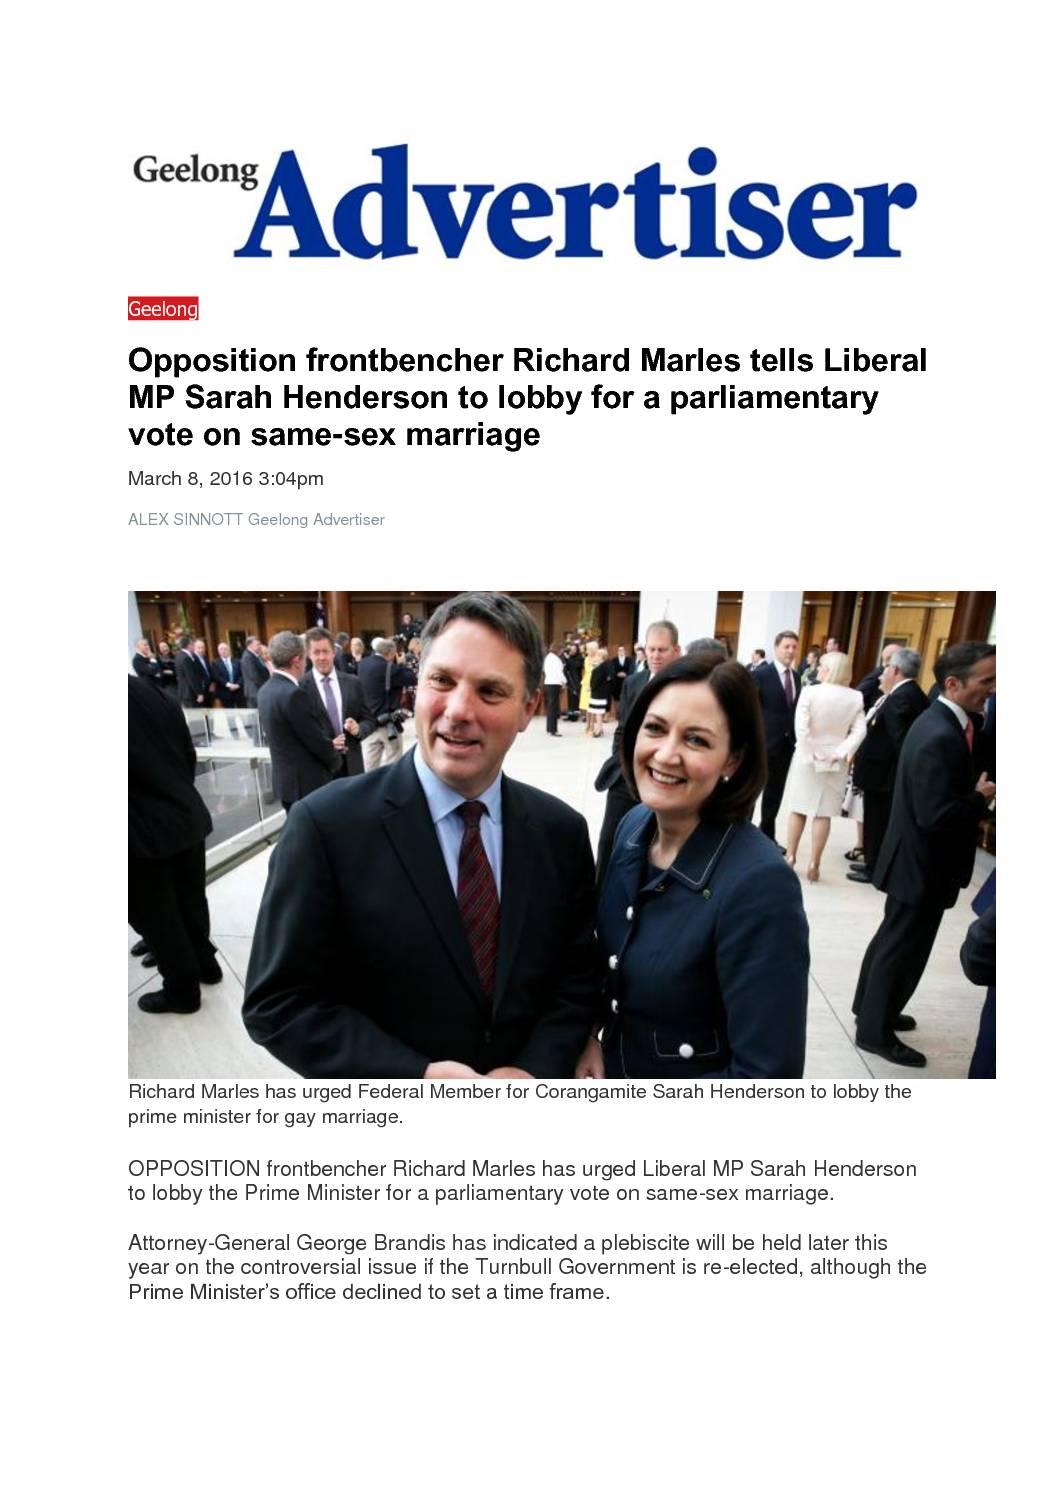 16.03.08 Same Sex marriage – Geelong Advertiser